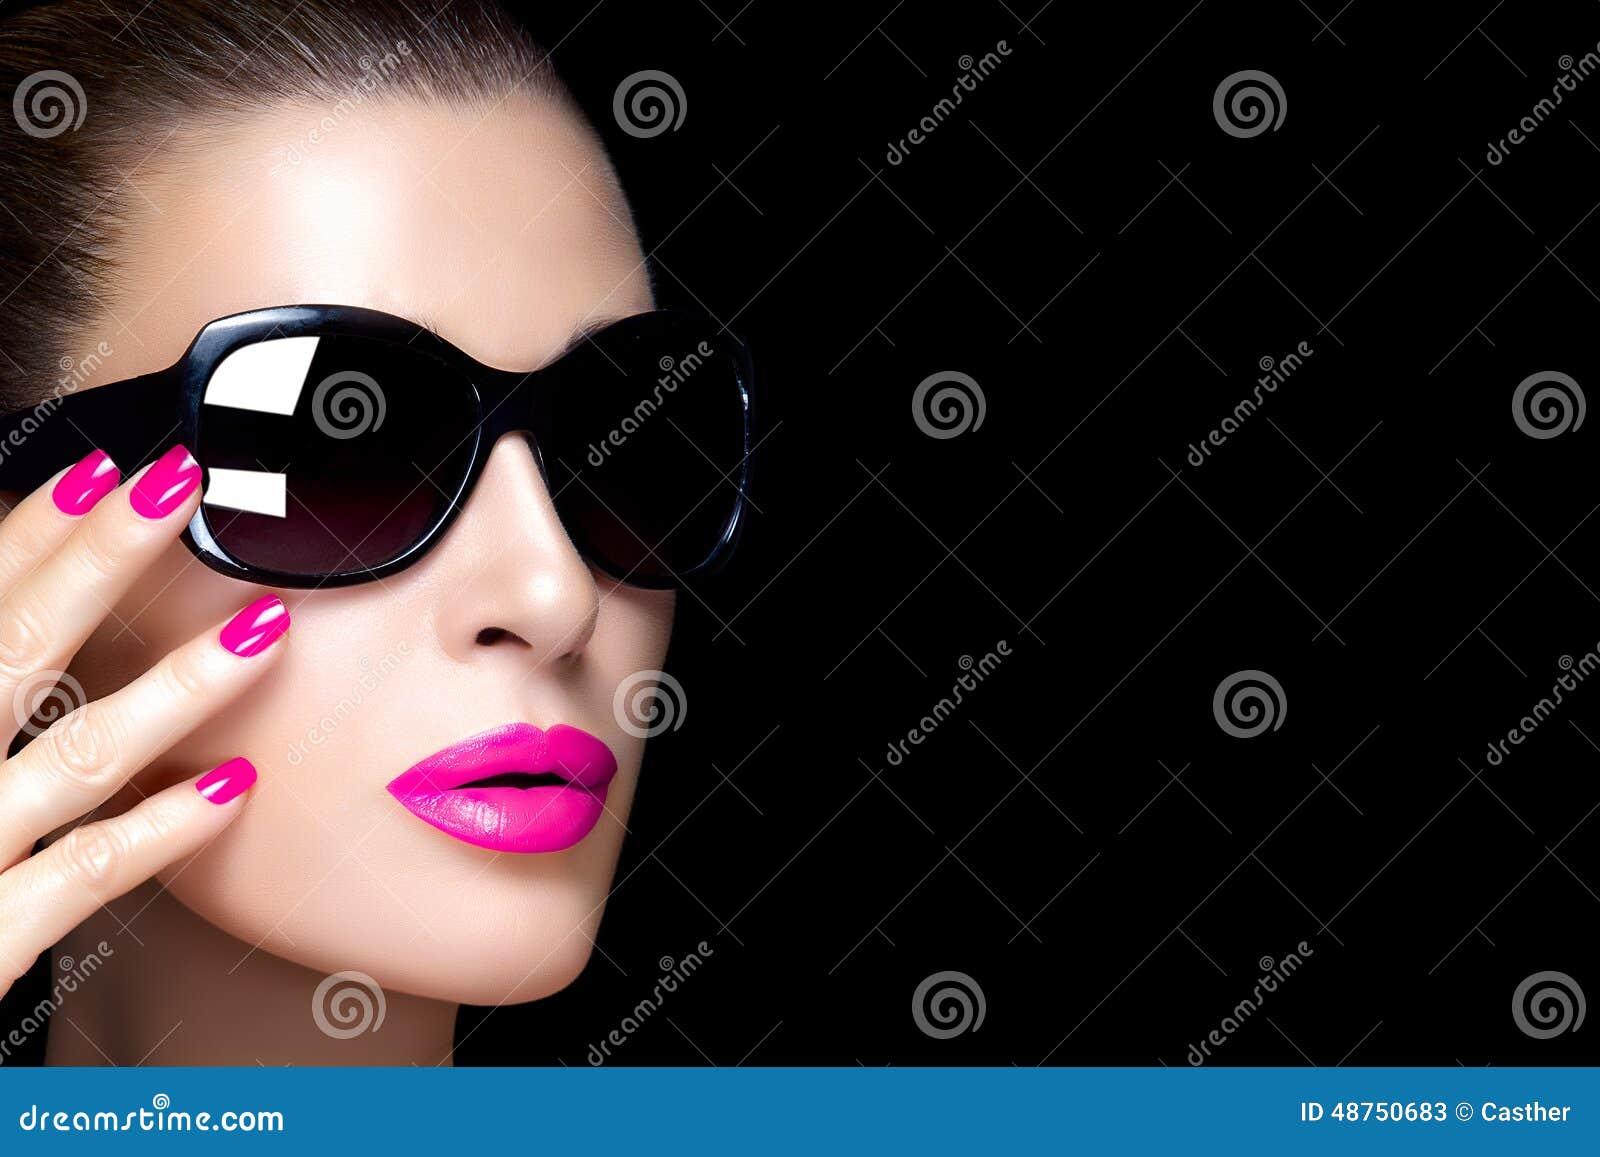 Fashion Model Woman In Black Oversized Sunglasses